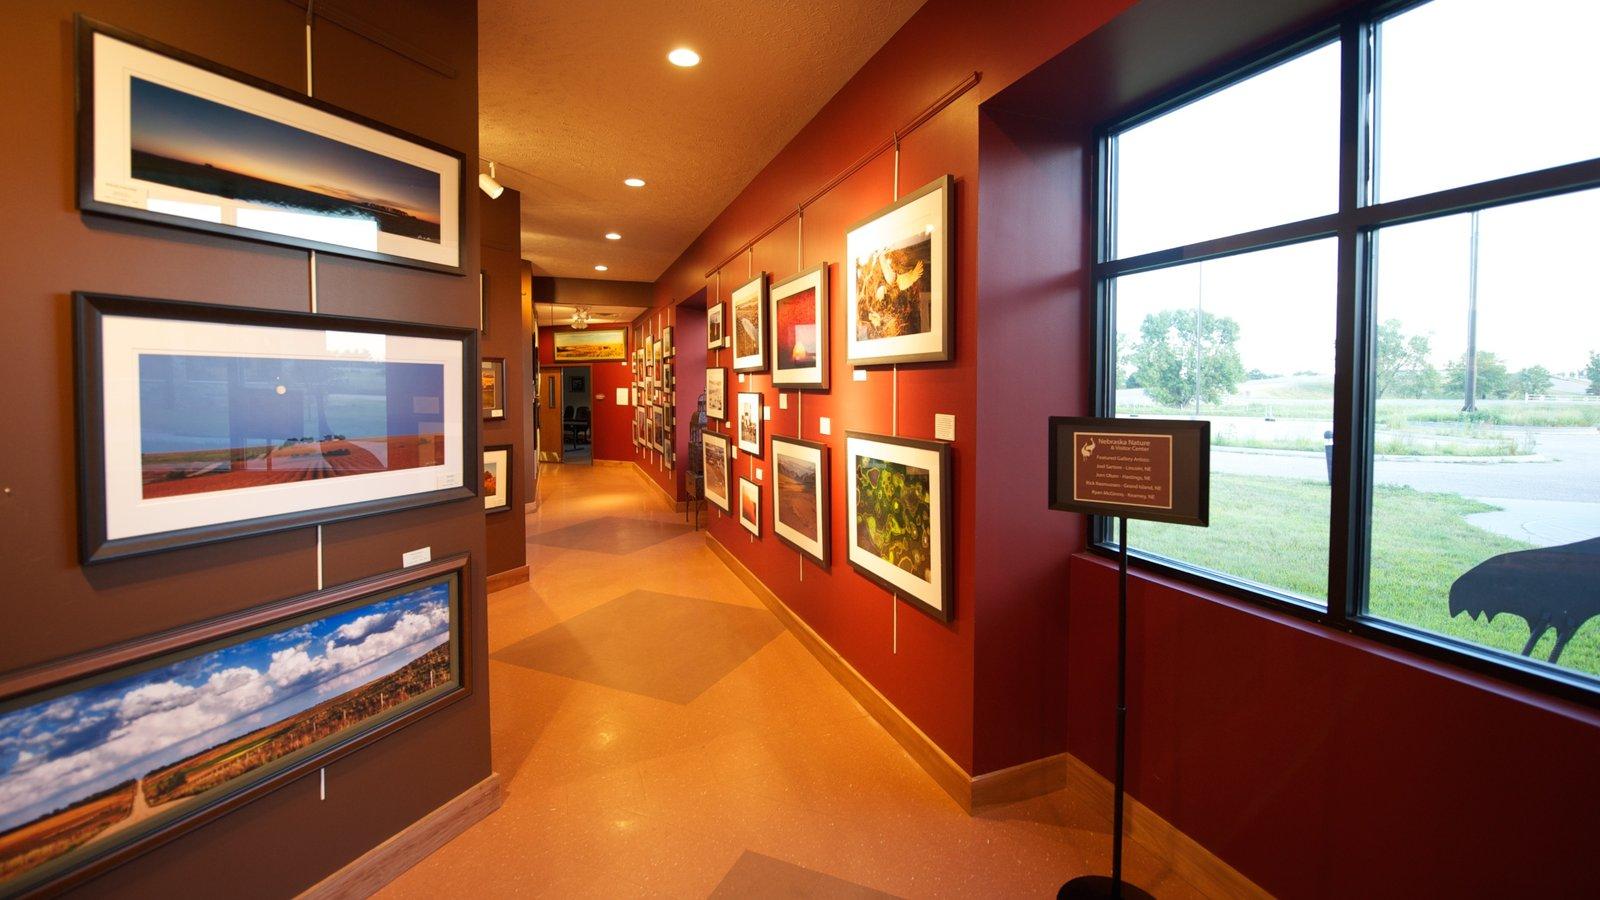 Grand Island caracterizando animais de zoológico, arte e vistas internas